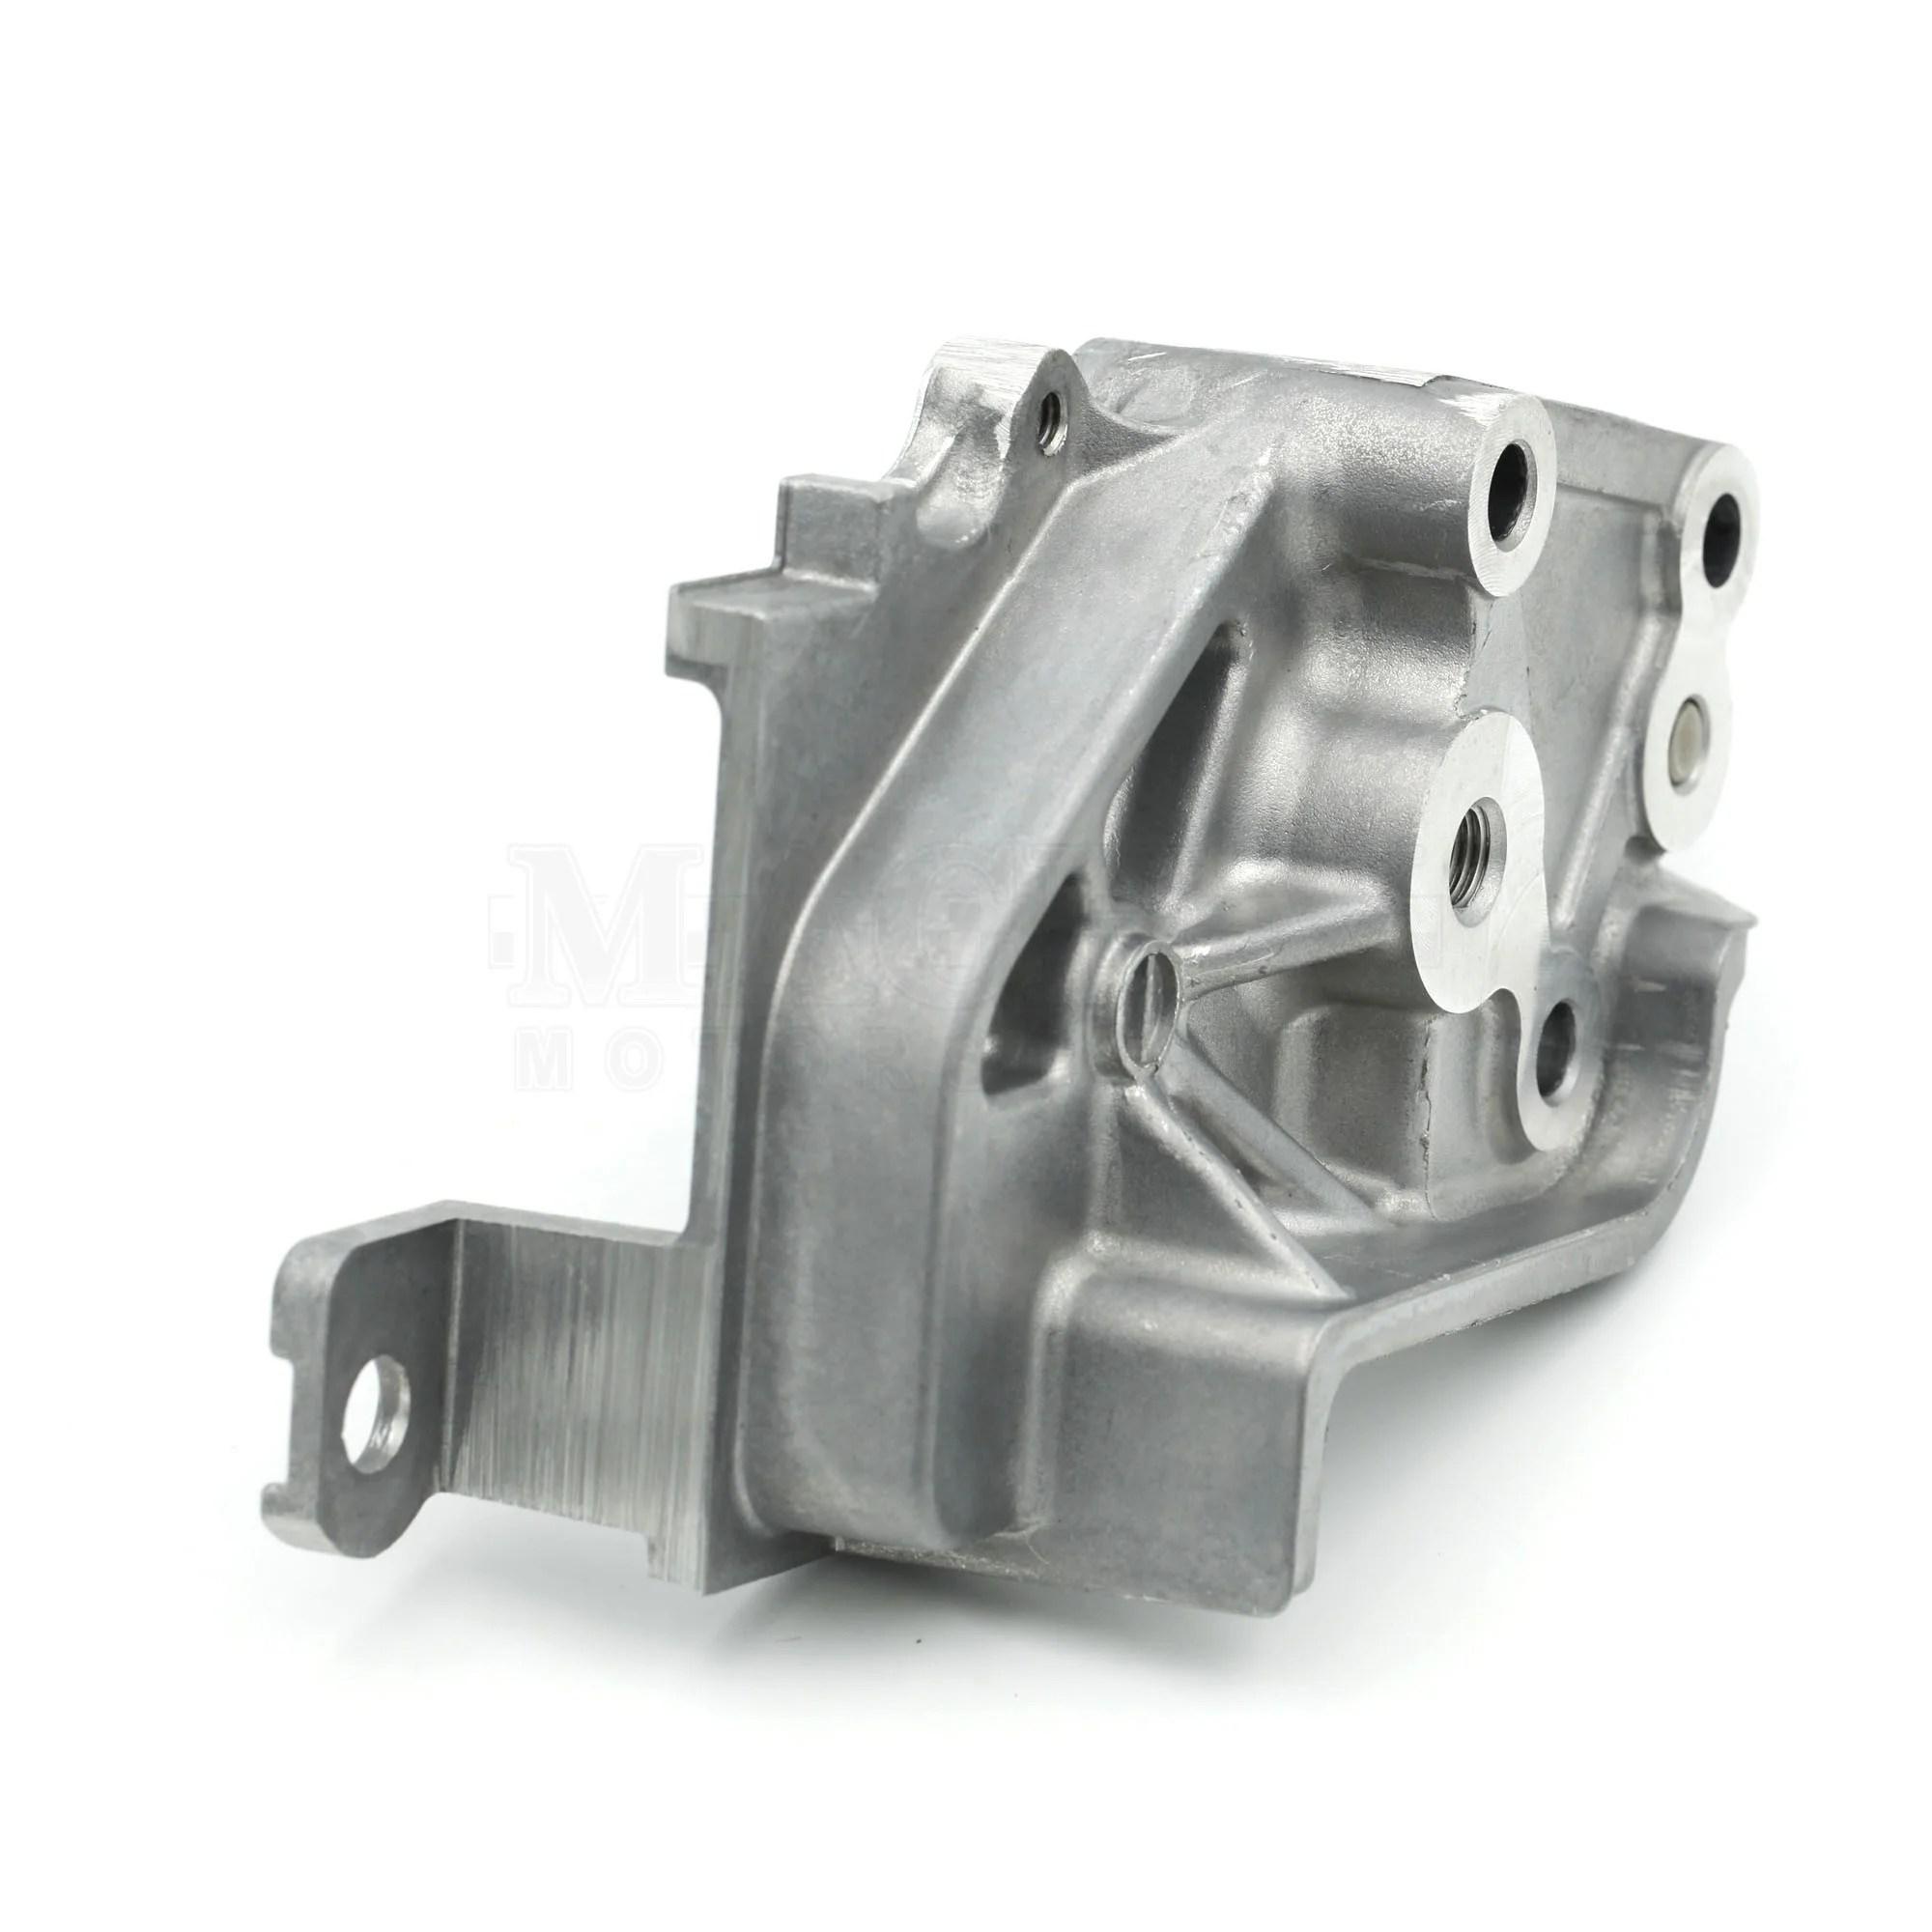 hight resolution of subaru timing belt tensioner bracket 2002 2007 wrx sti